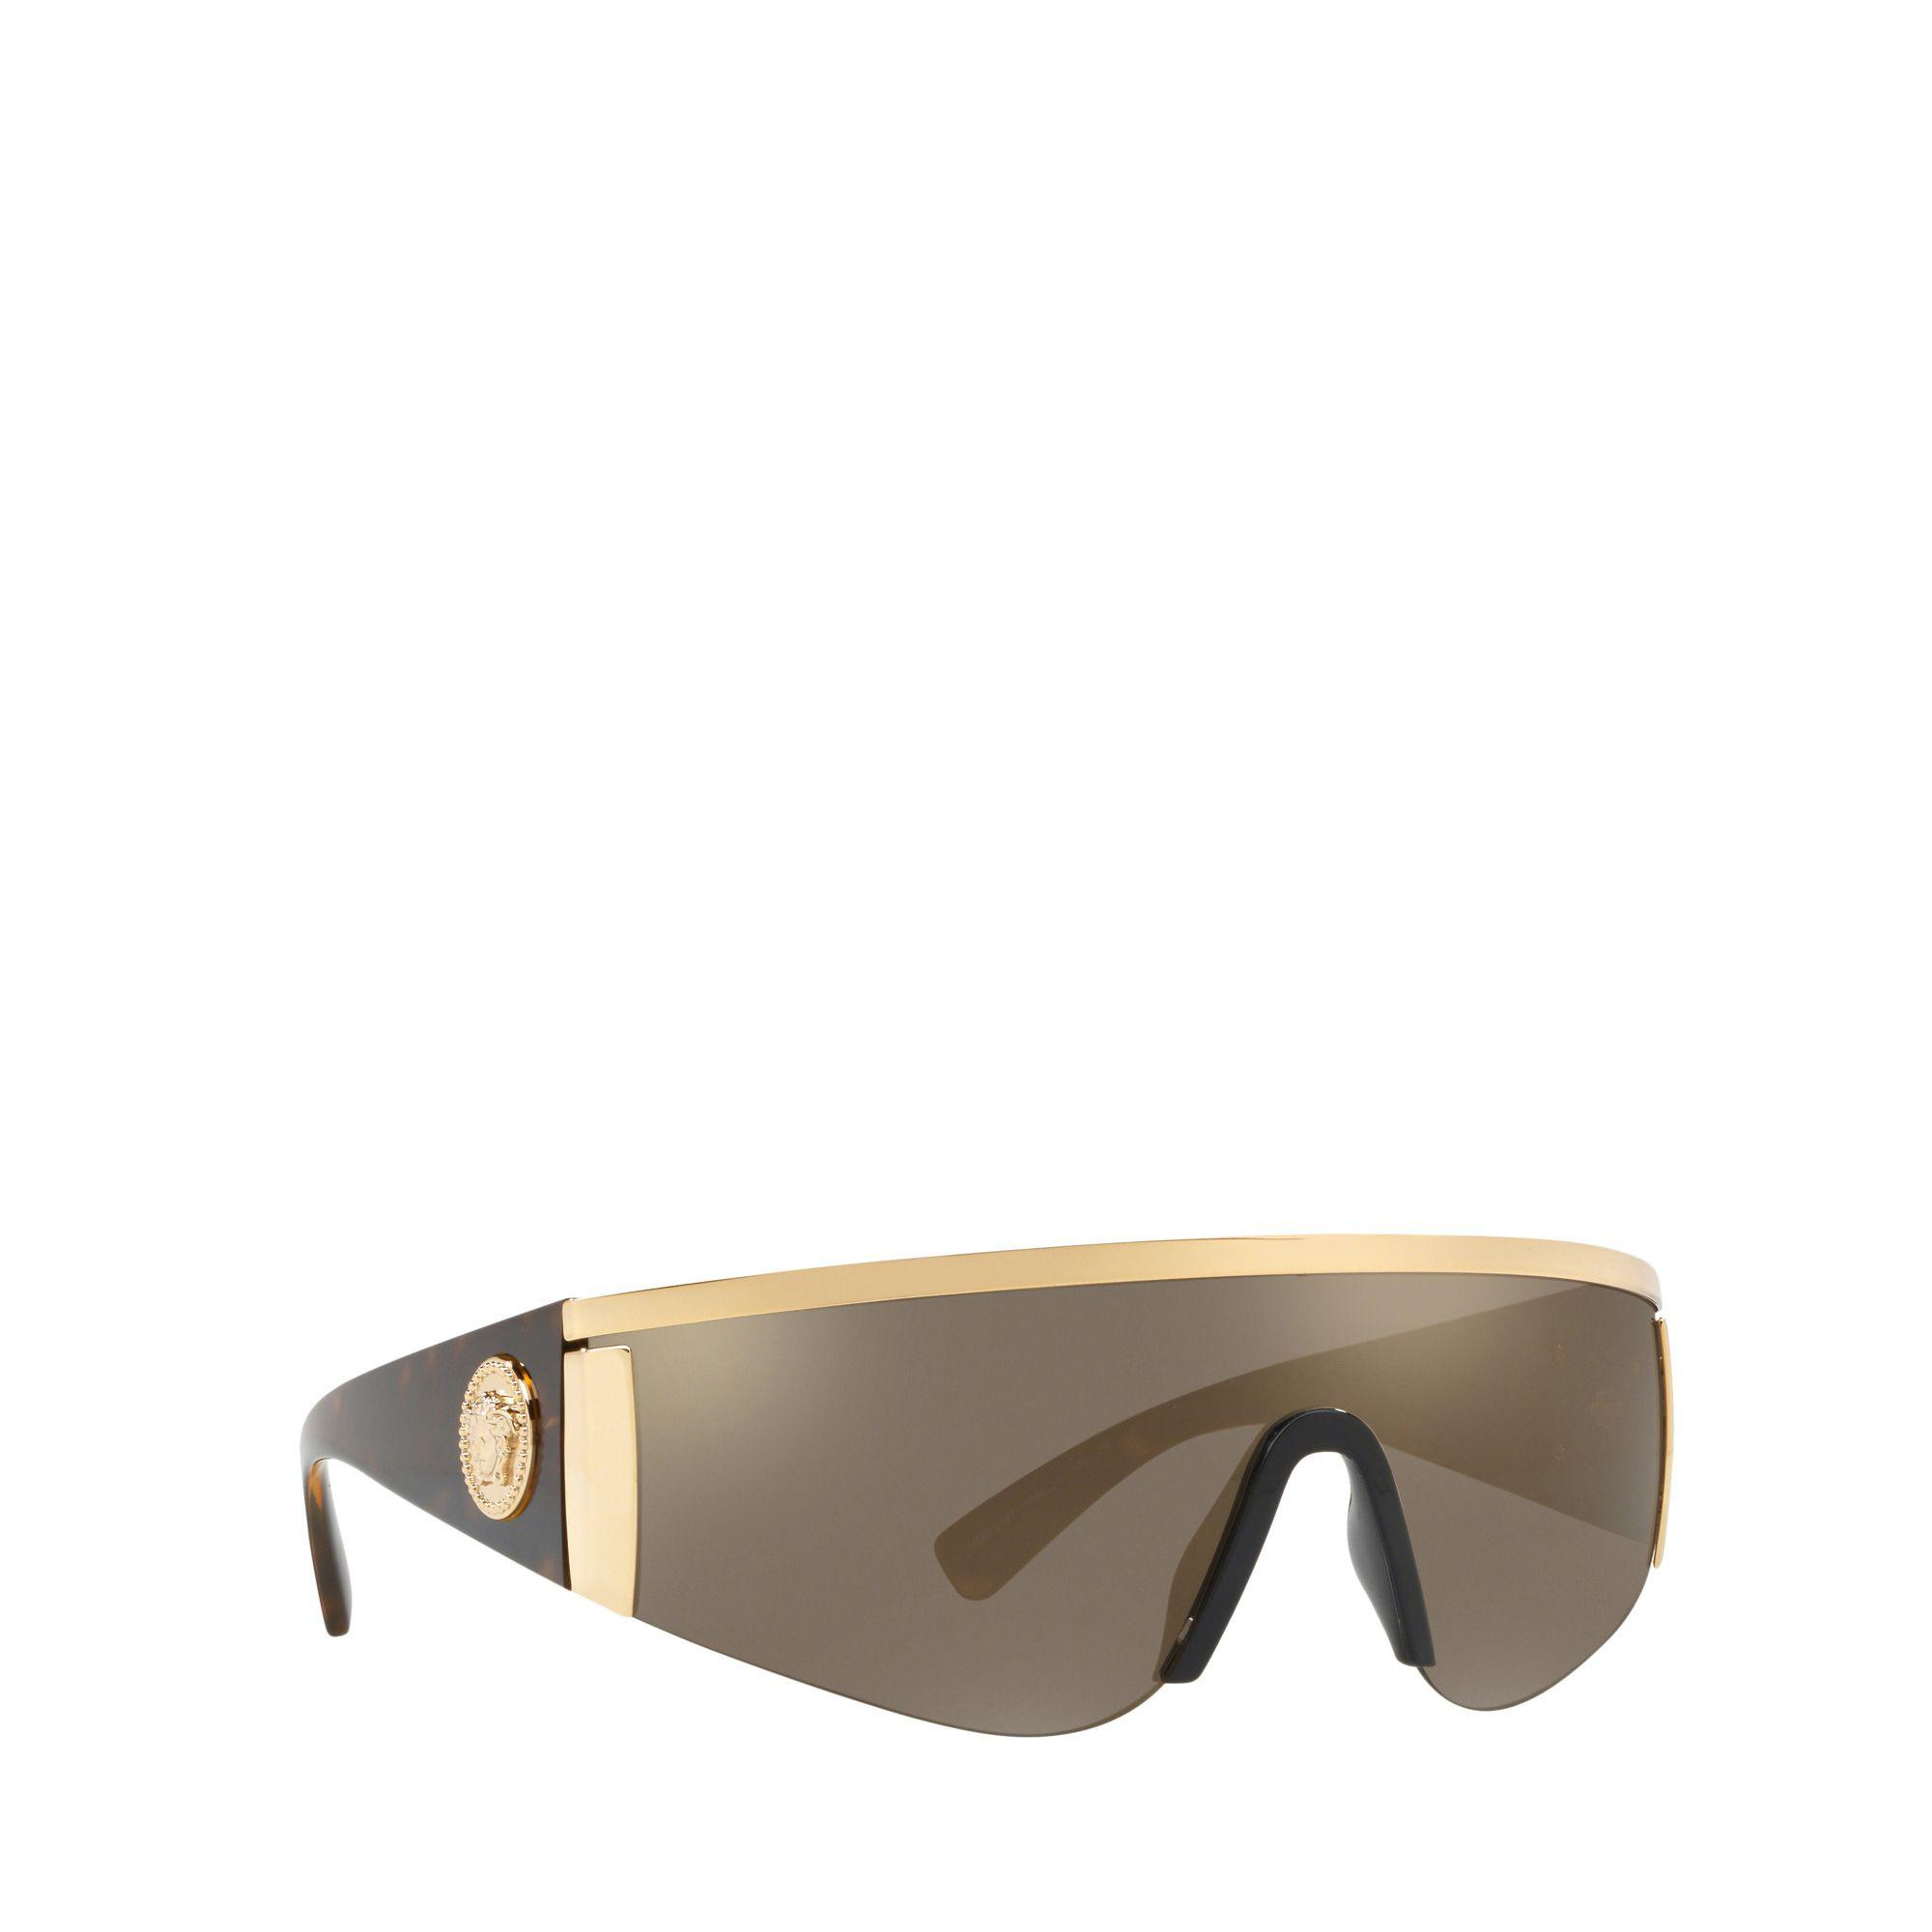 11c0d3cb2f9 Versace Gold 0ve2197 Irregular Sunglasses in Metallic for Men - Lyst